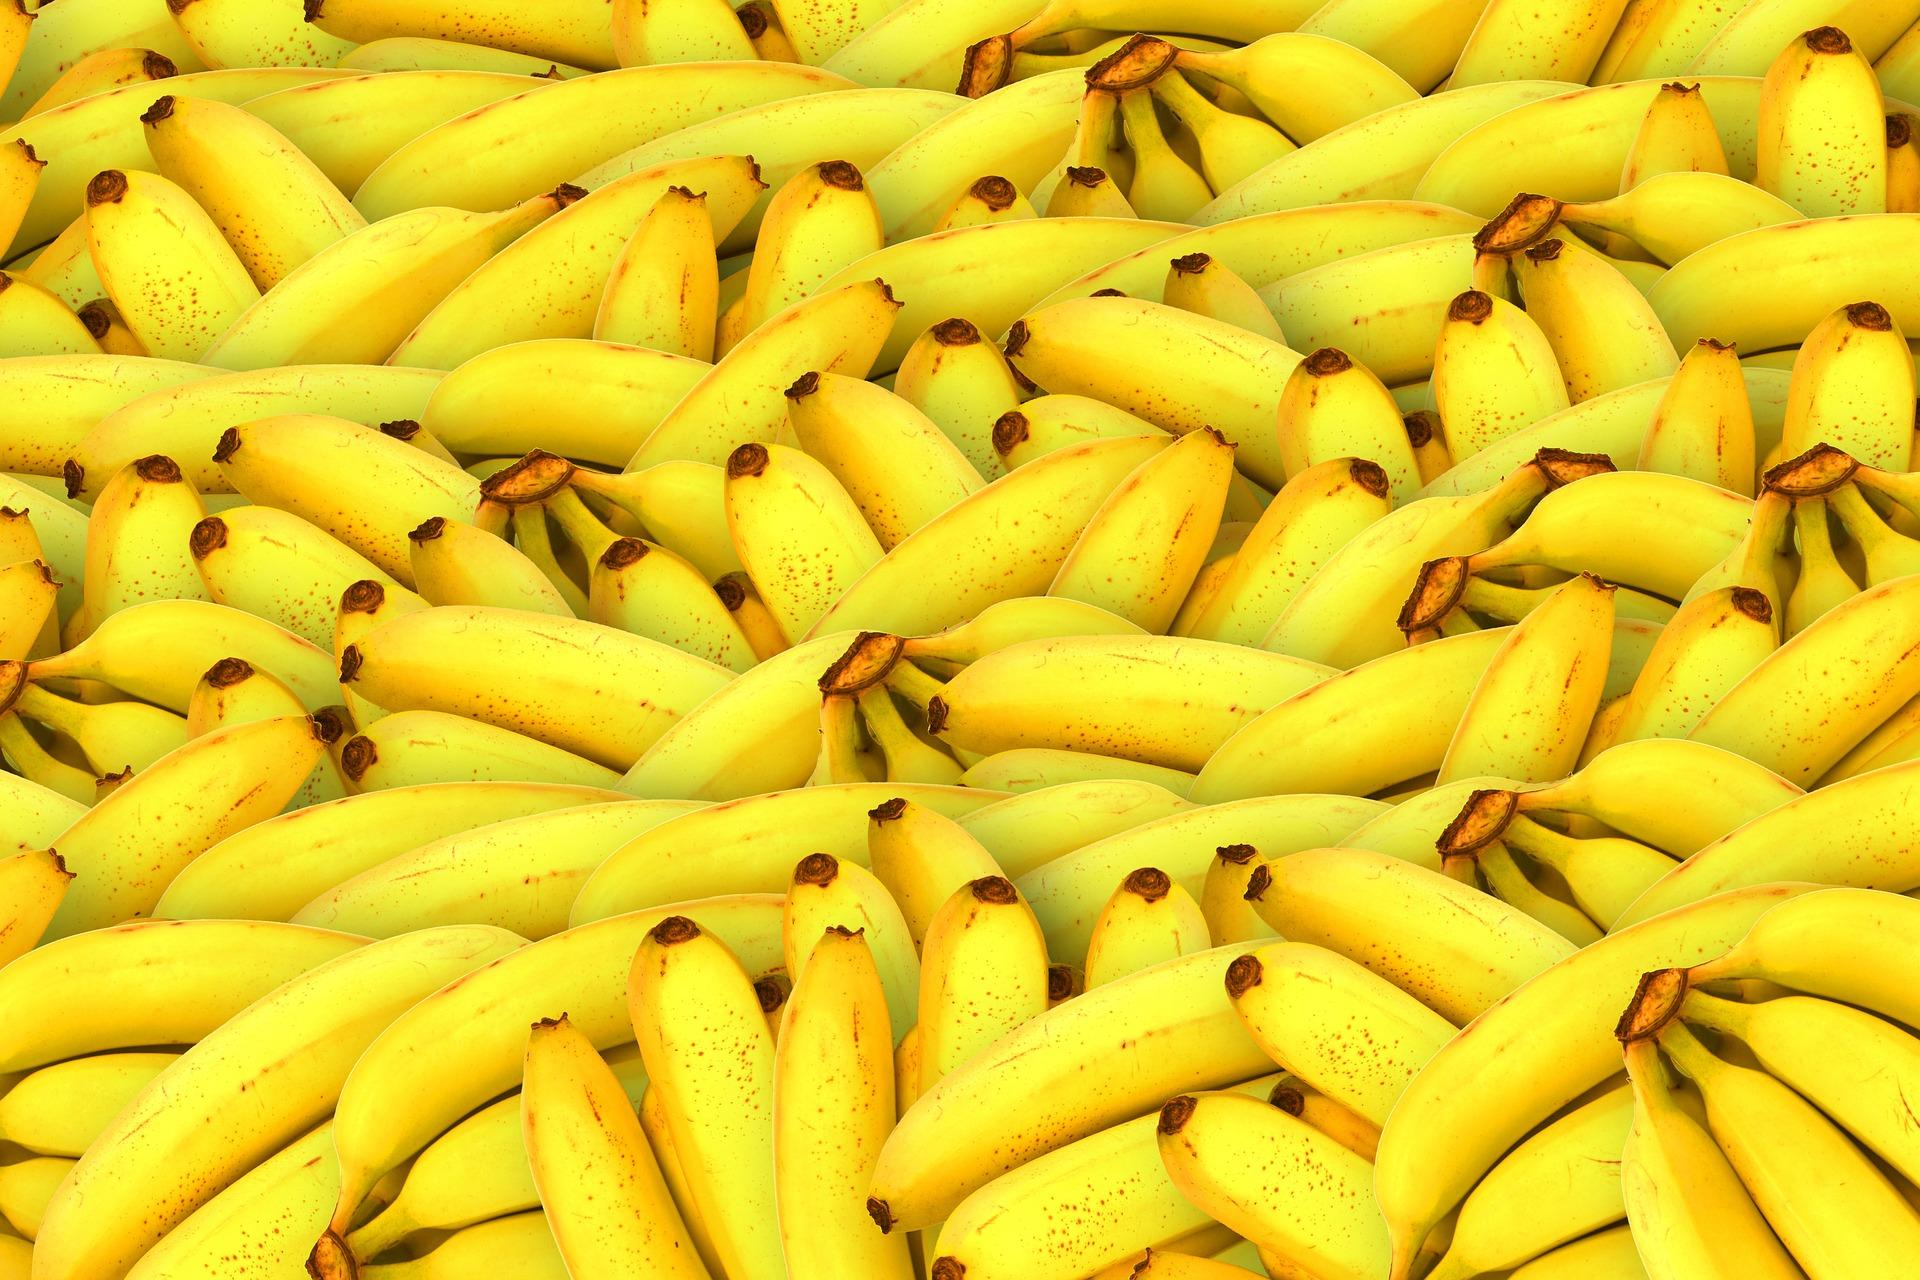 bananas-1119790_1920.jpg